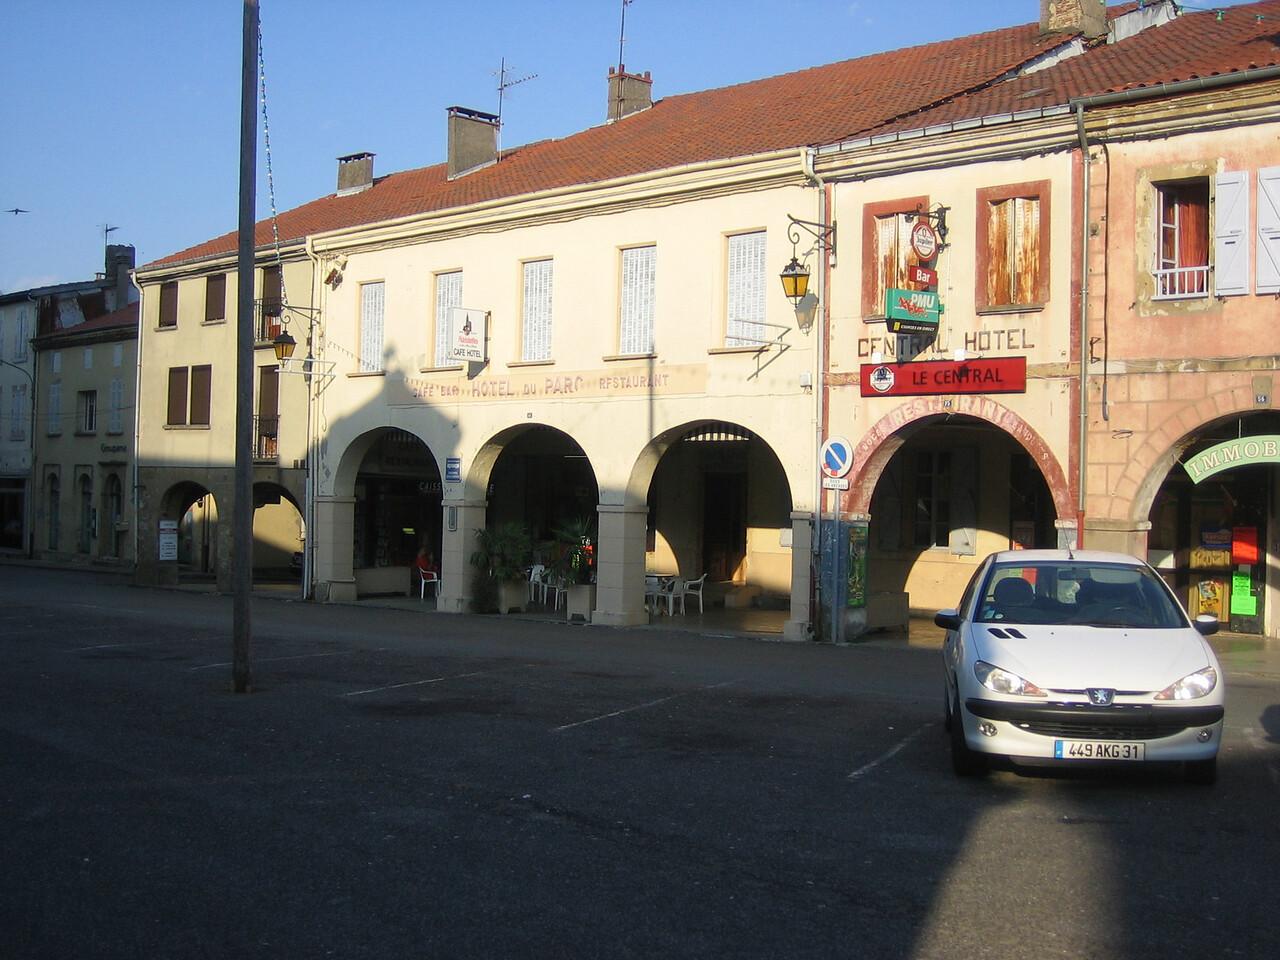 Hotel we stayed in Boulogne-sur-la-Gesse